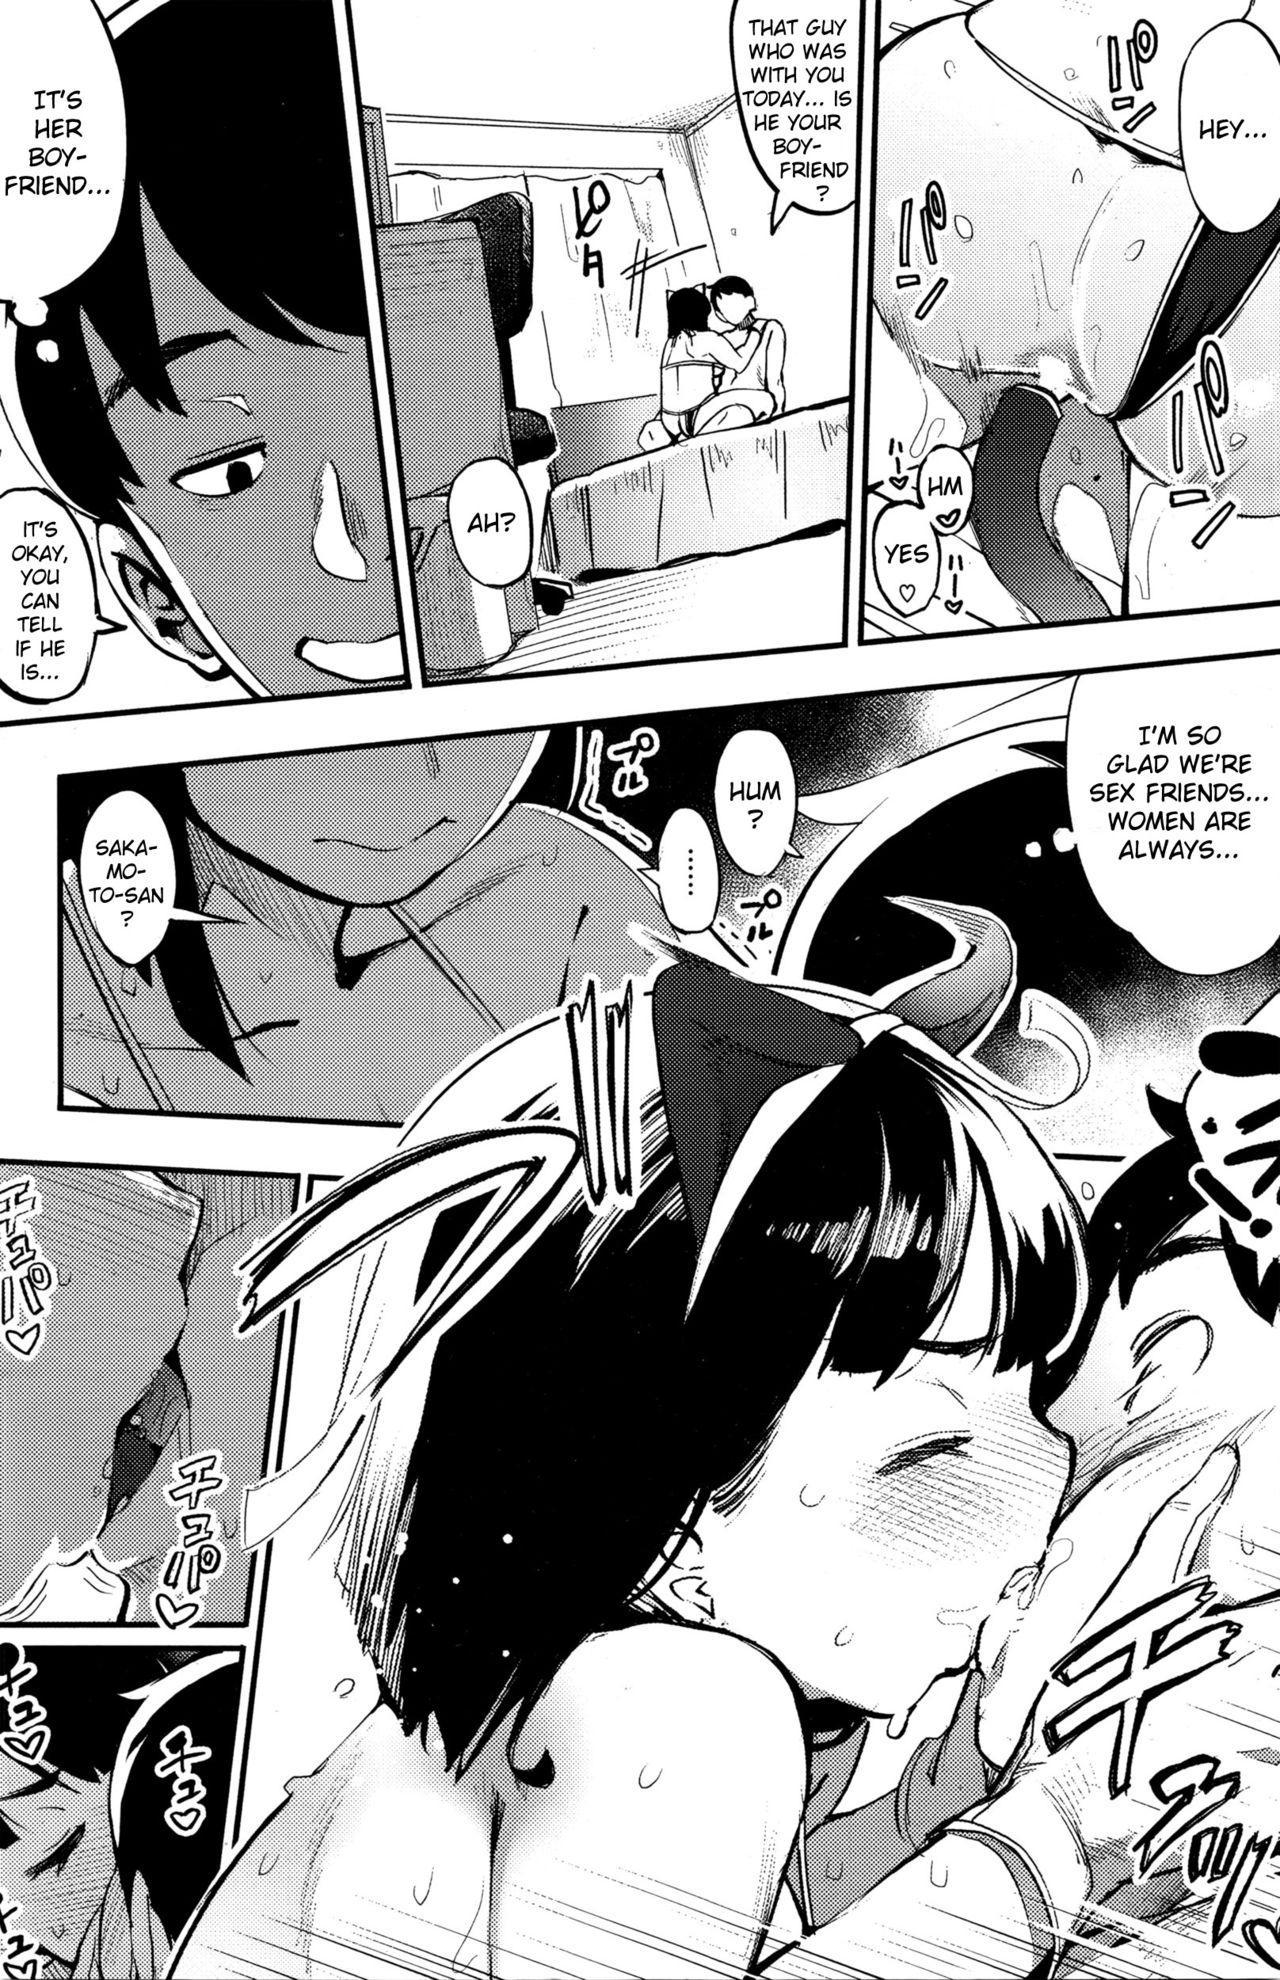 [Rocket Monkey] Kikimimi ~Risou no Kanojo~   The Ideal Girlfriend (COMIC HOTMILK 2016-04) [English] {anon} 12